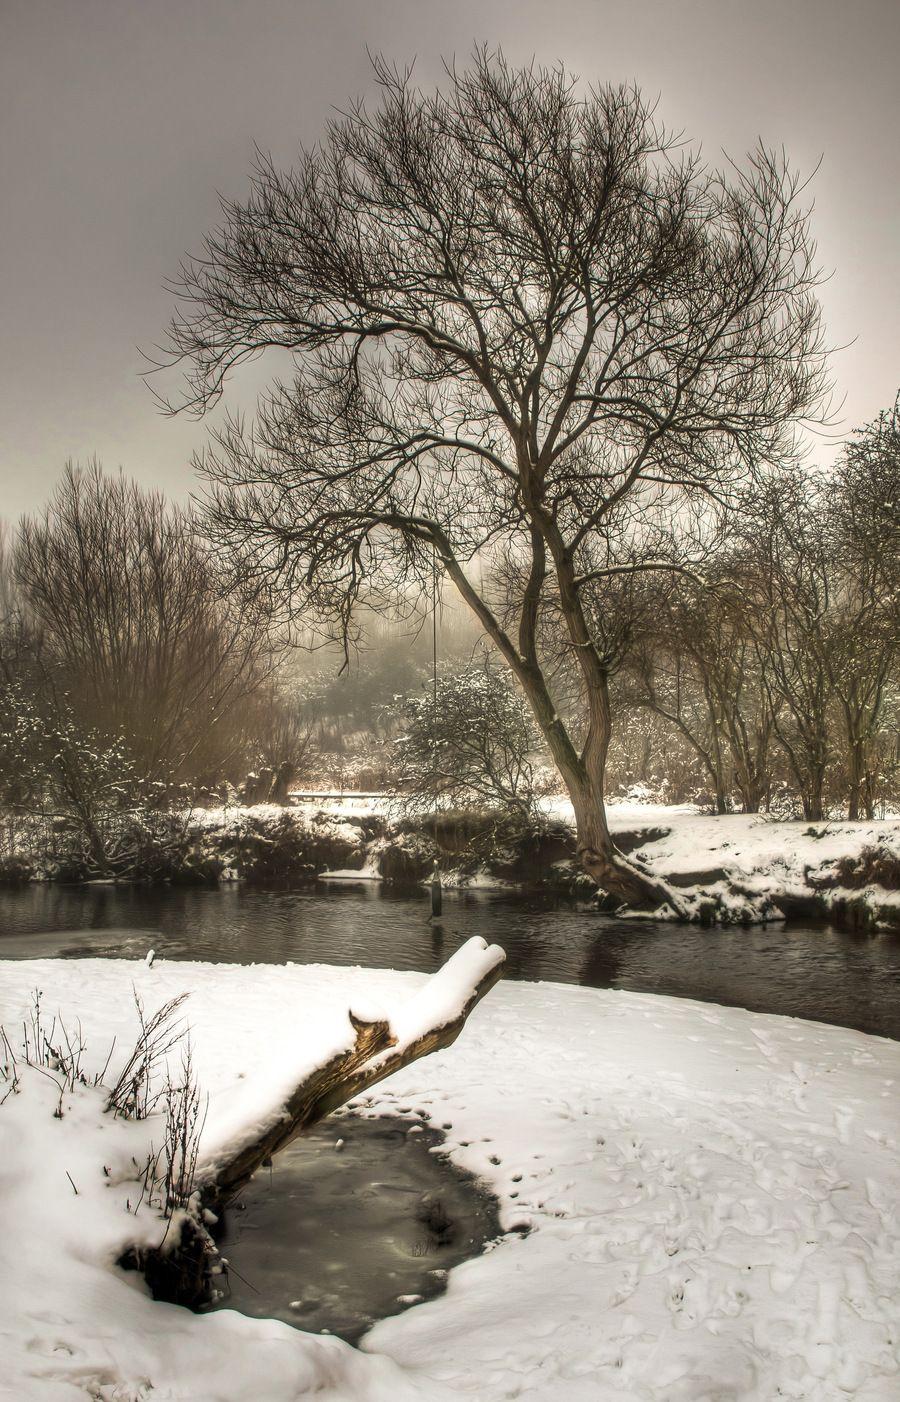 Snow at the river